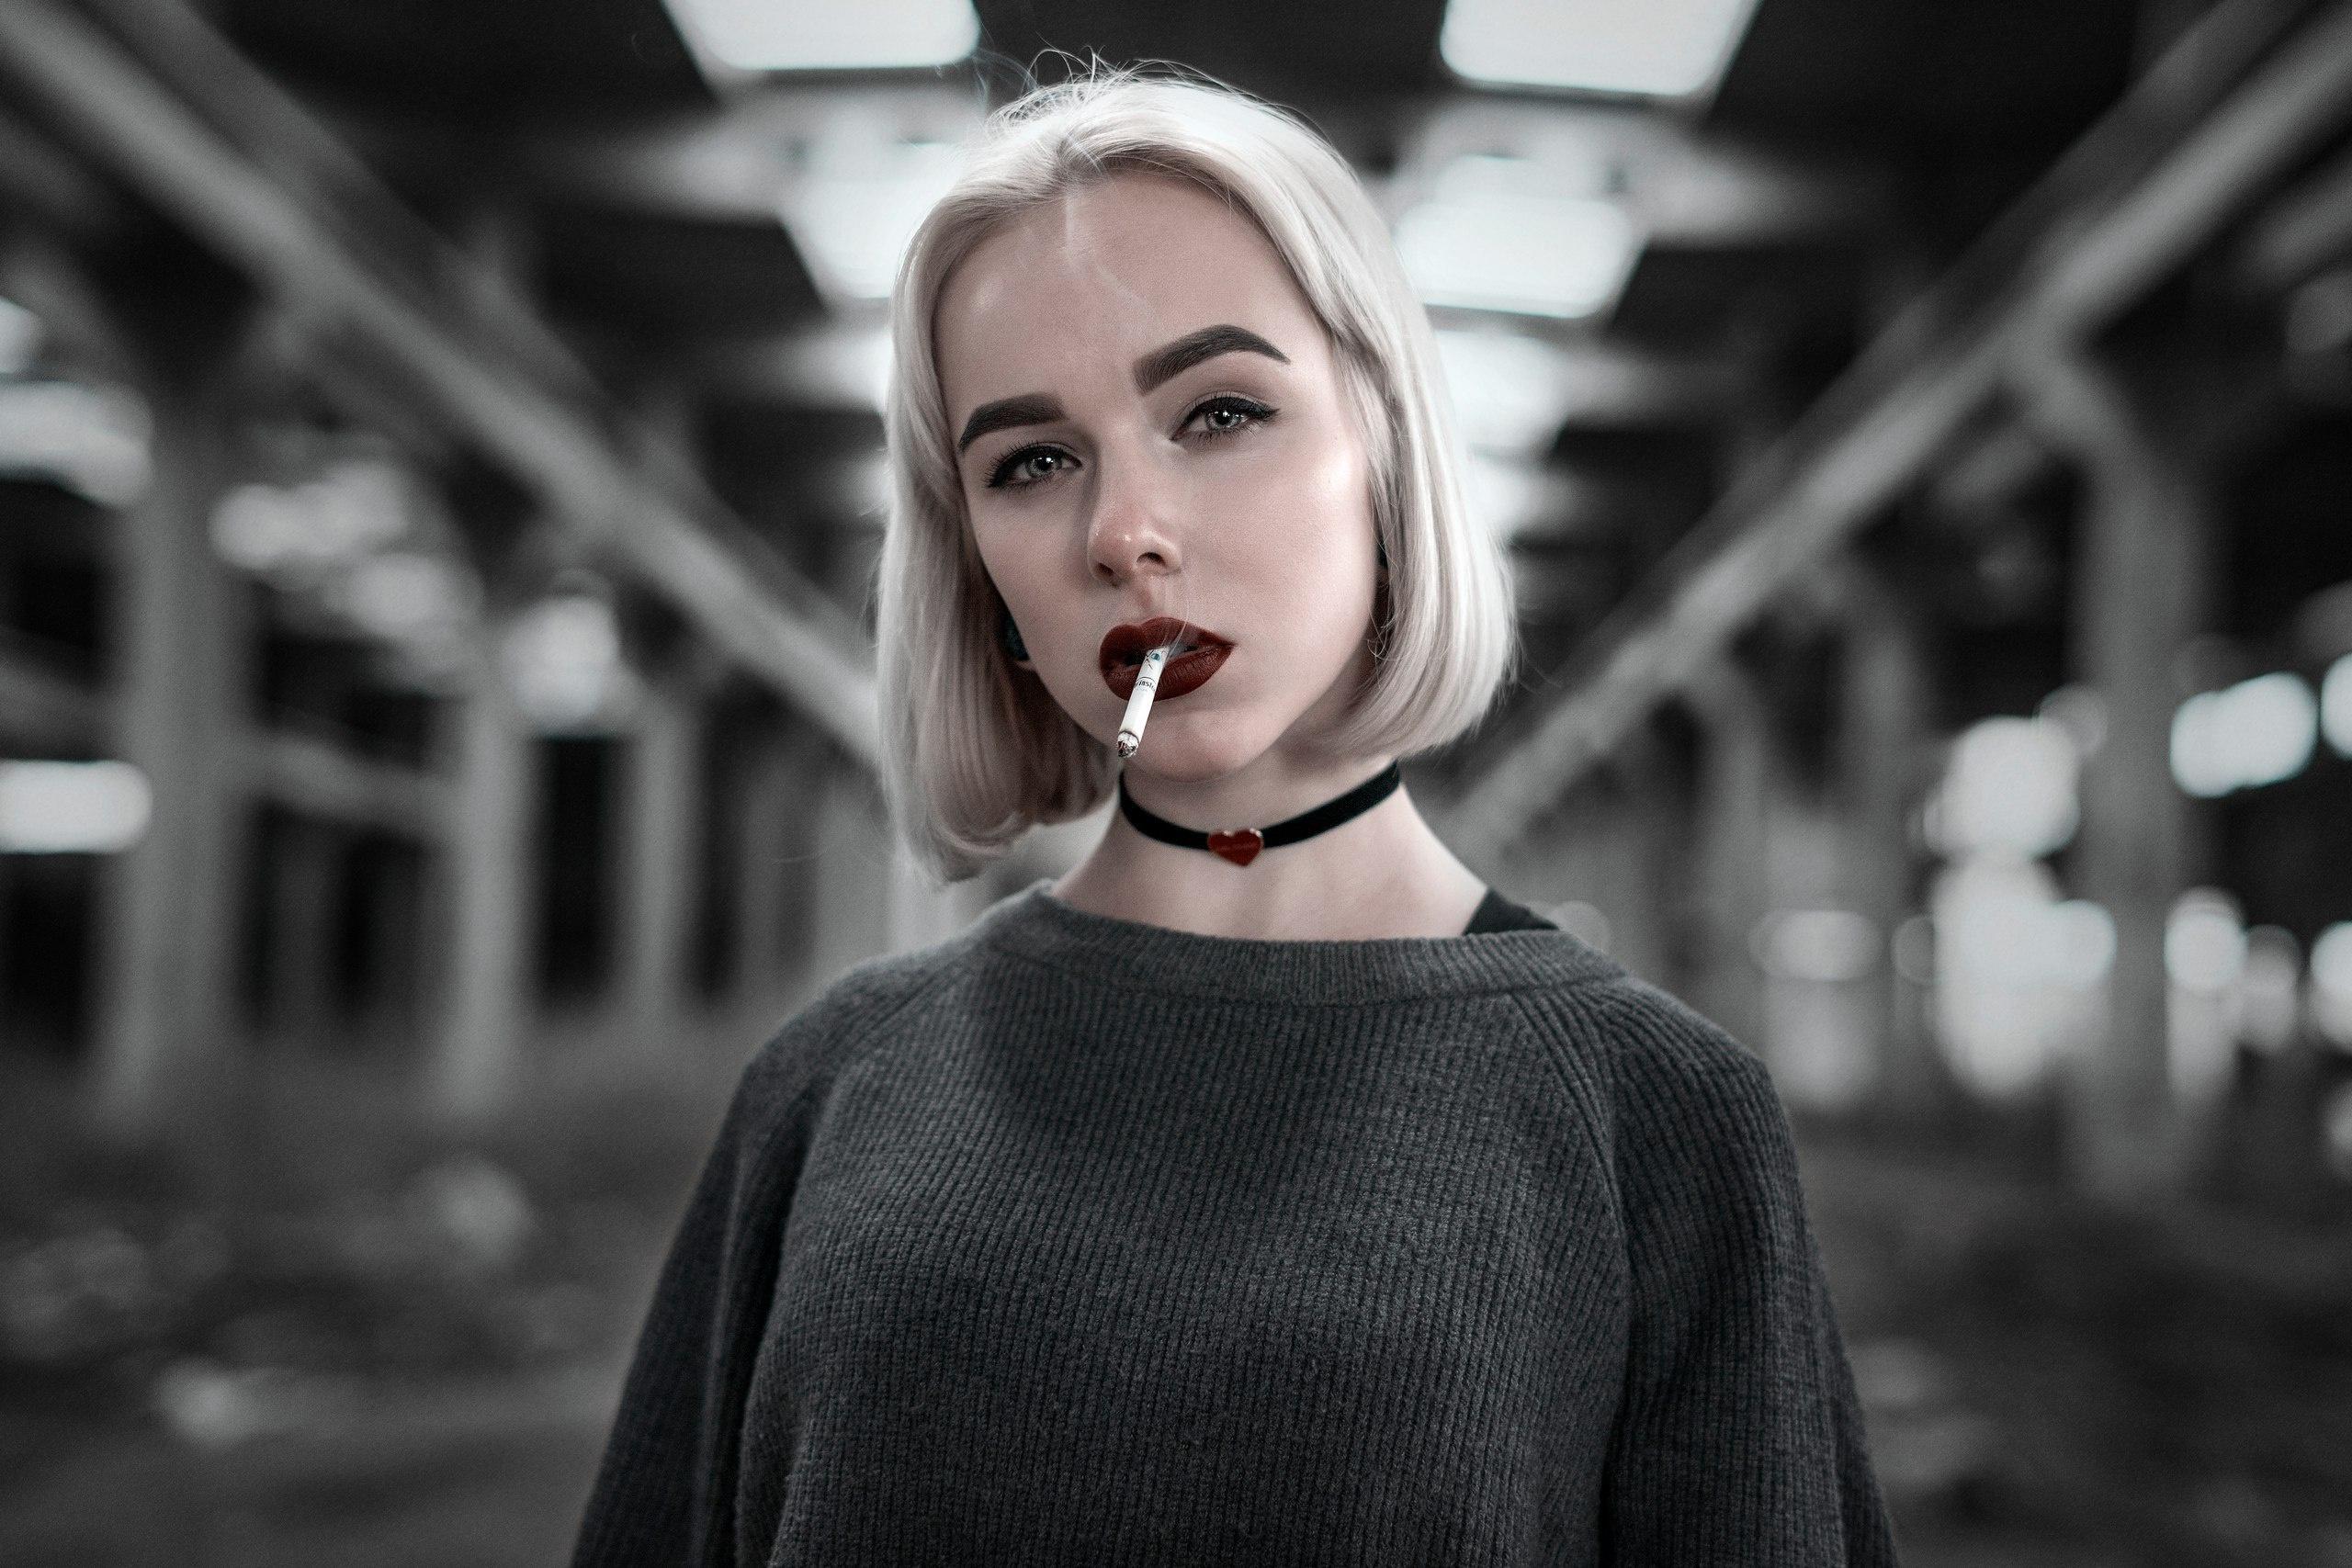 Blonde girl margarita, beautiful womens pussy gif pix